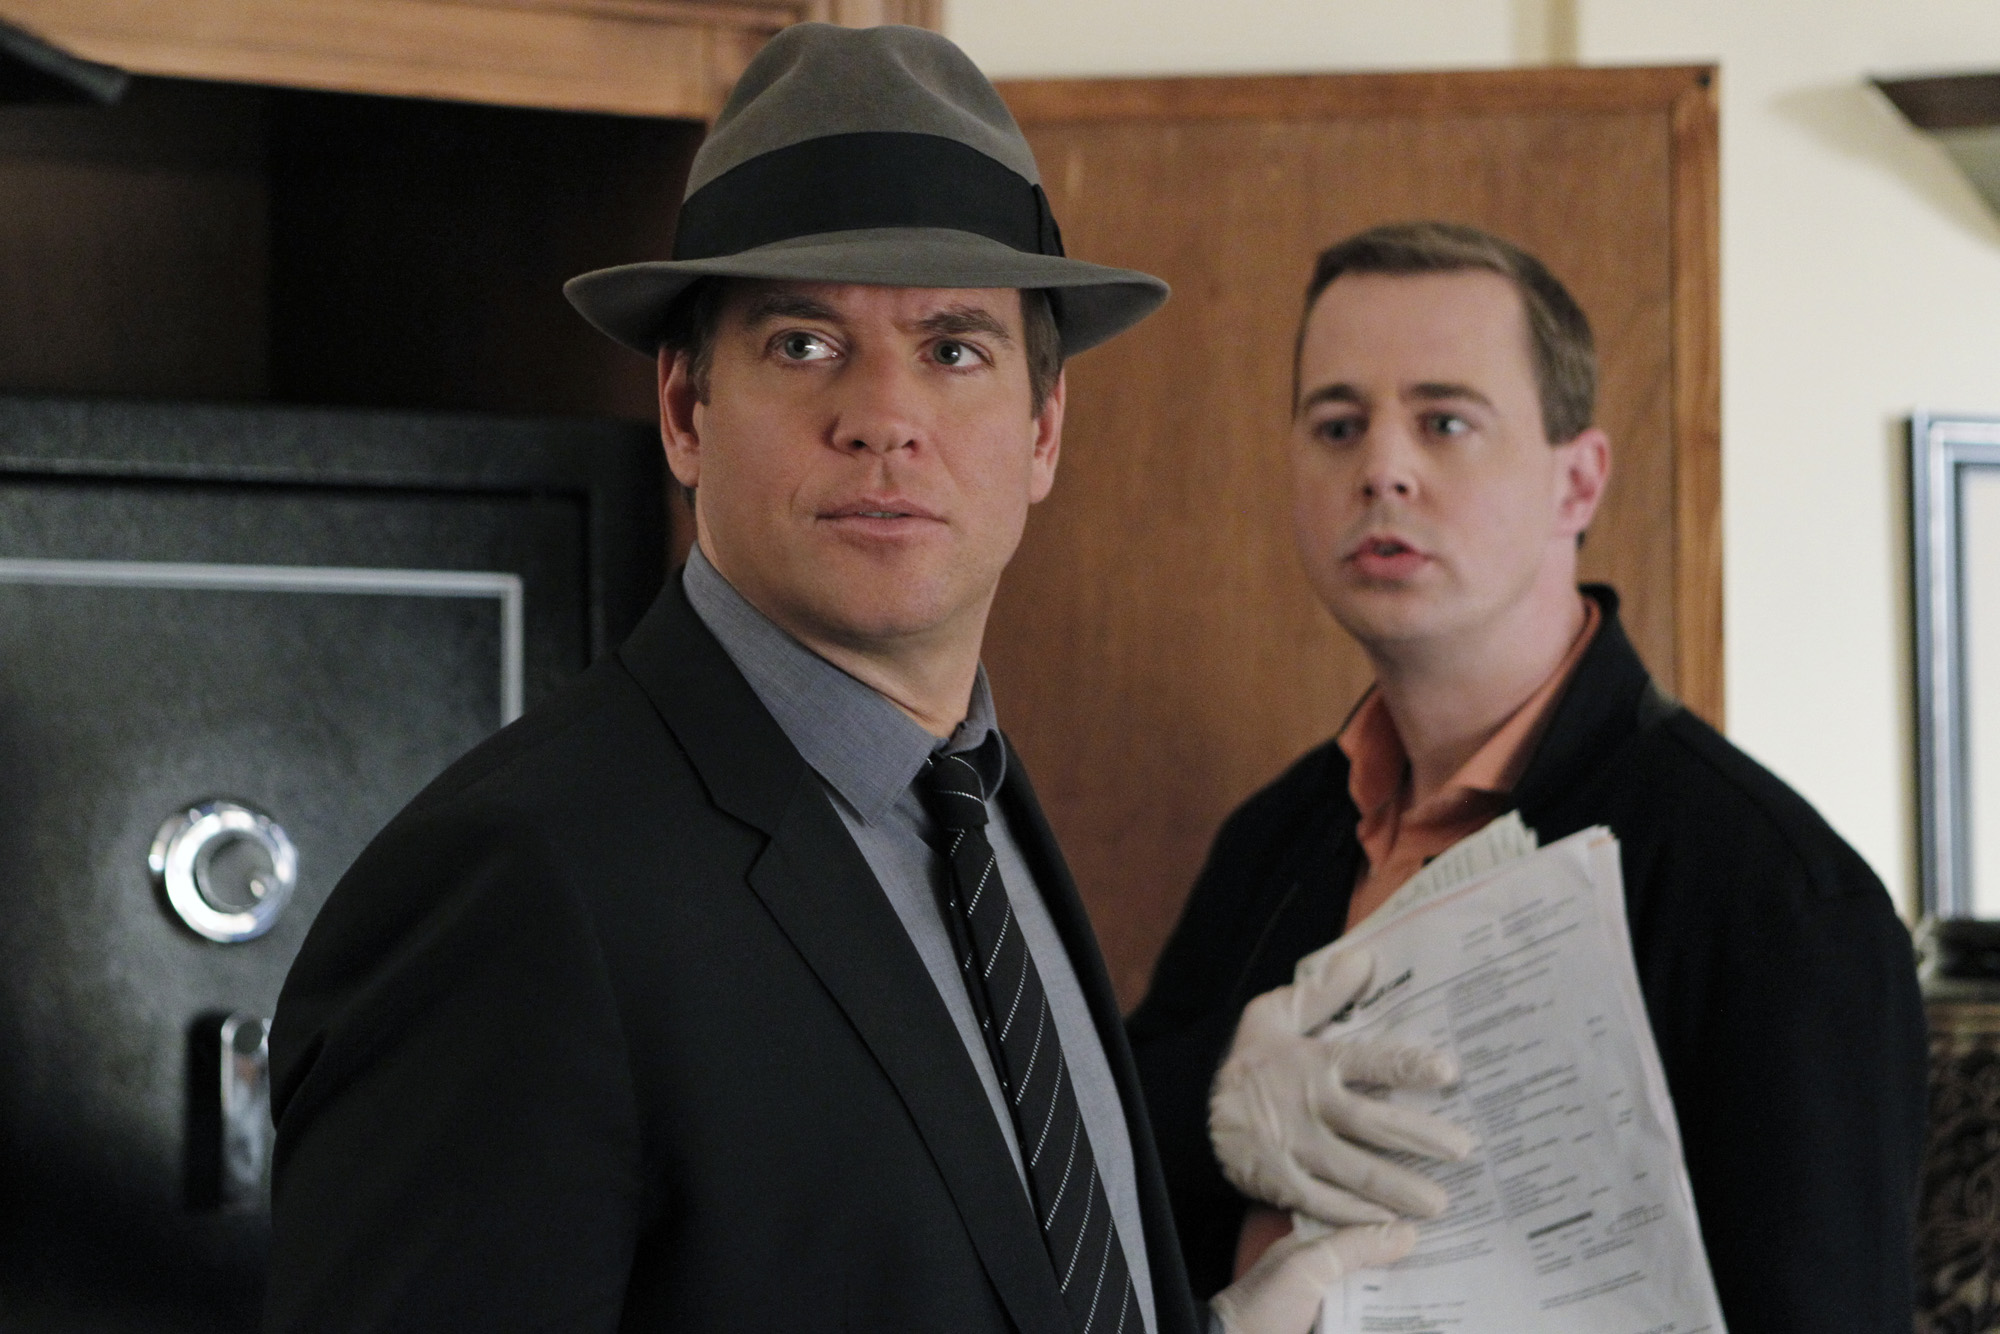 Detective Work in